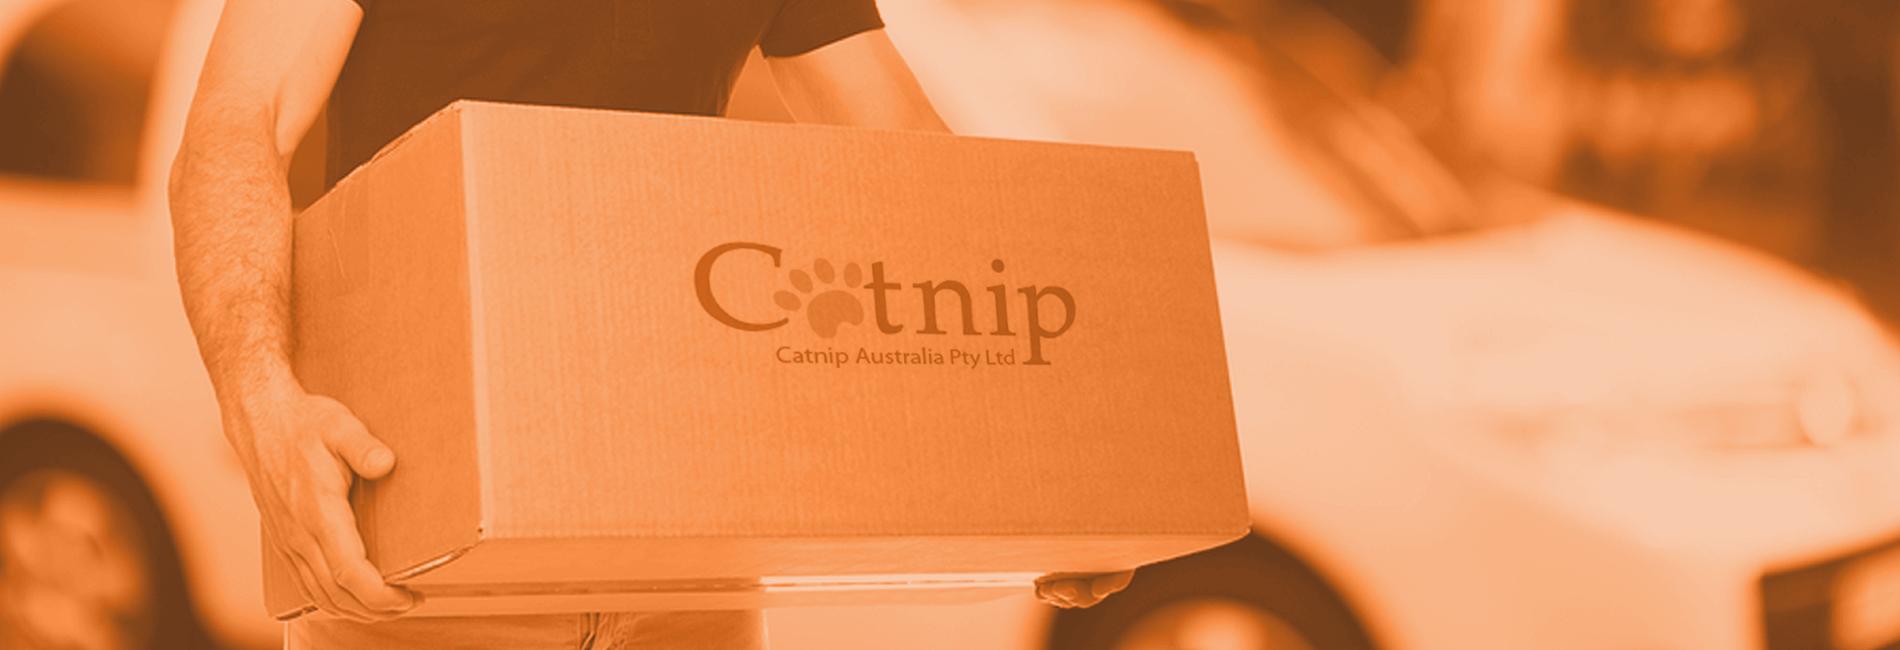 catnip-delivery